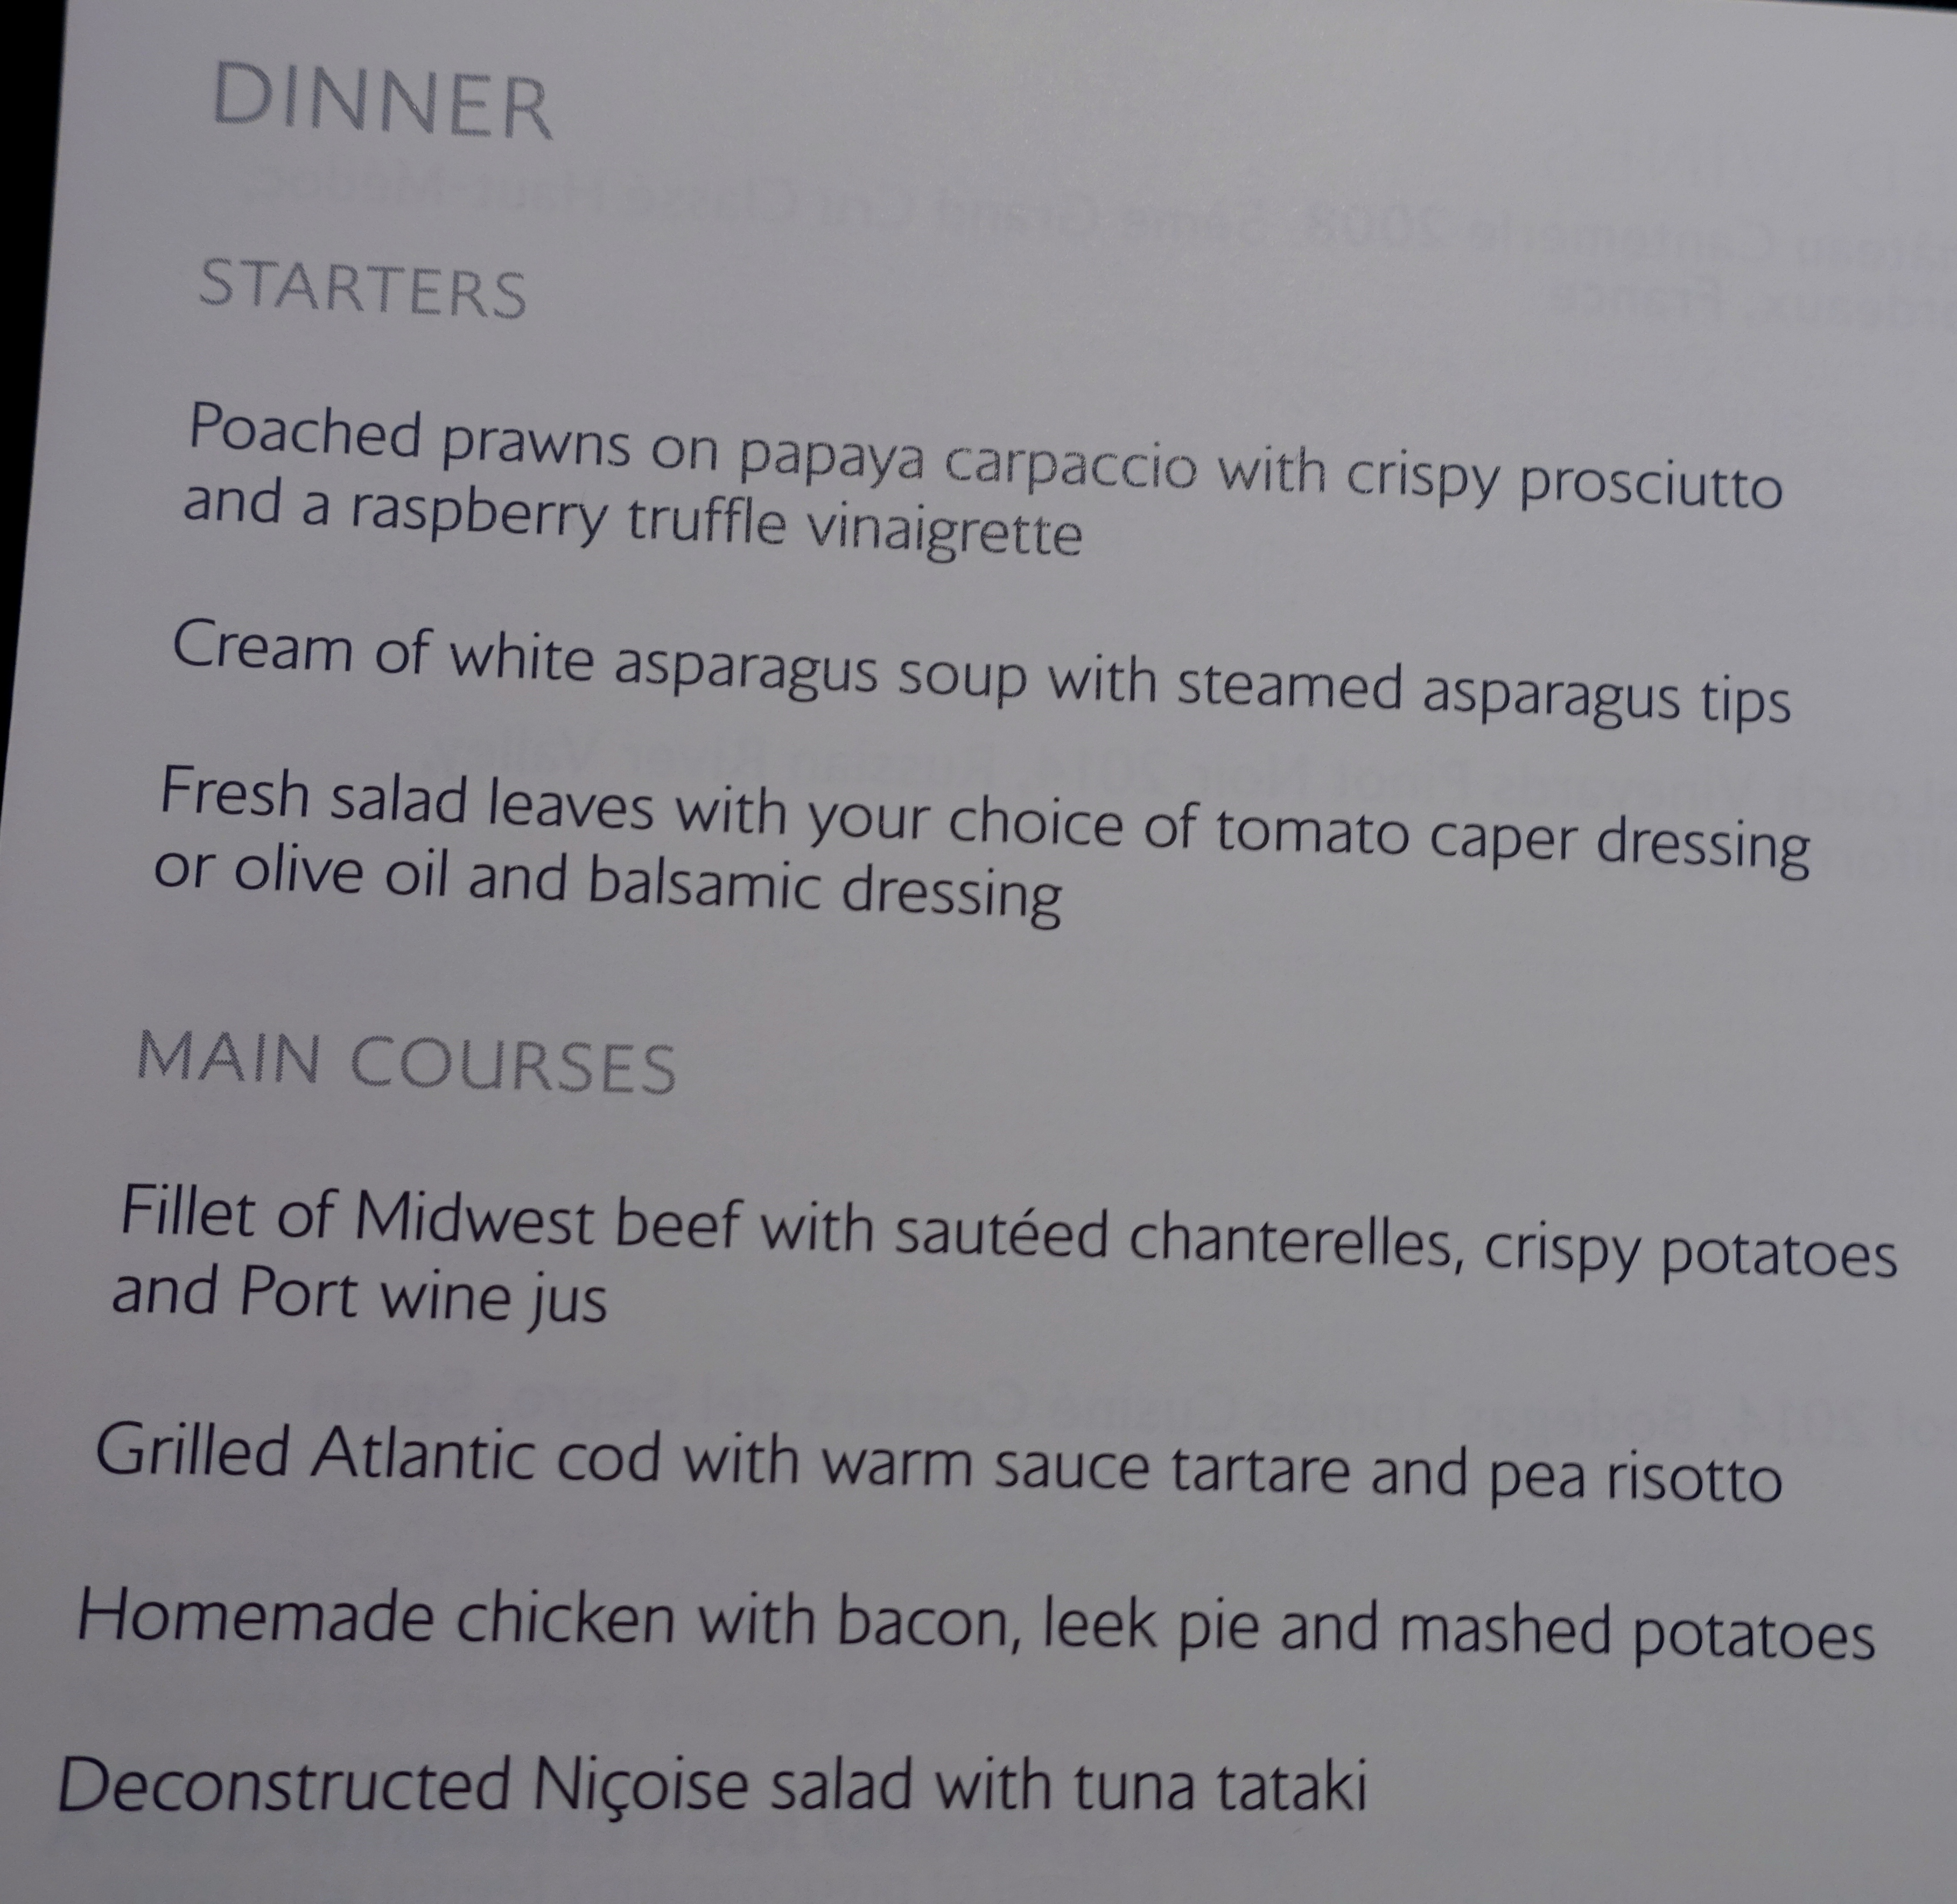 British Airways First Class Dinner Menu, New York to London